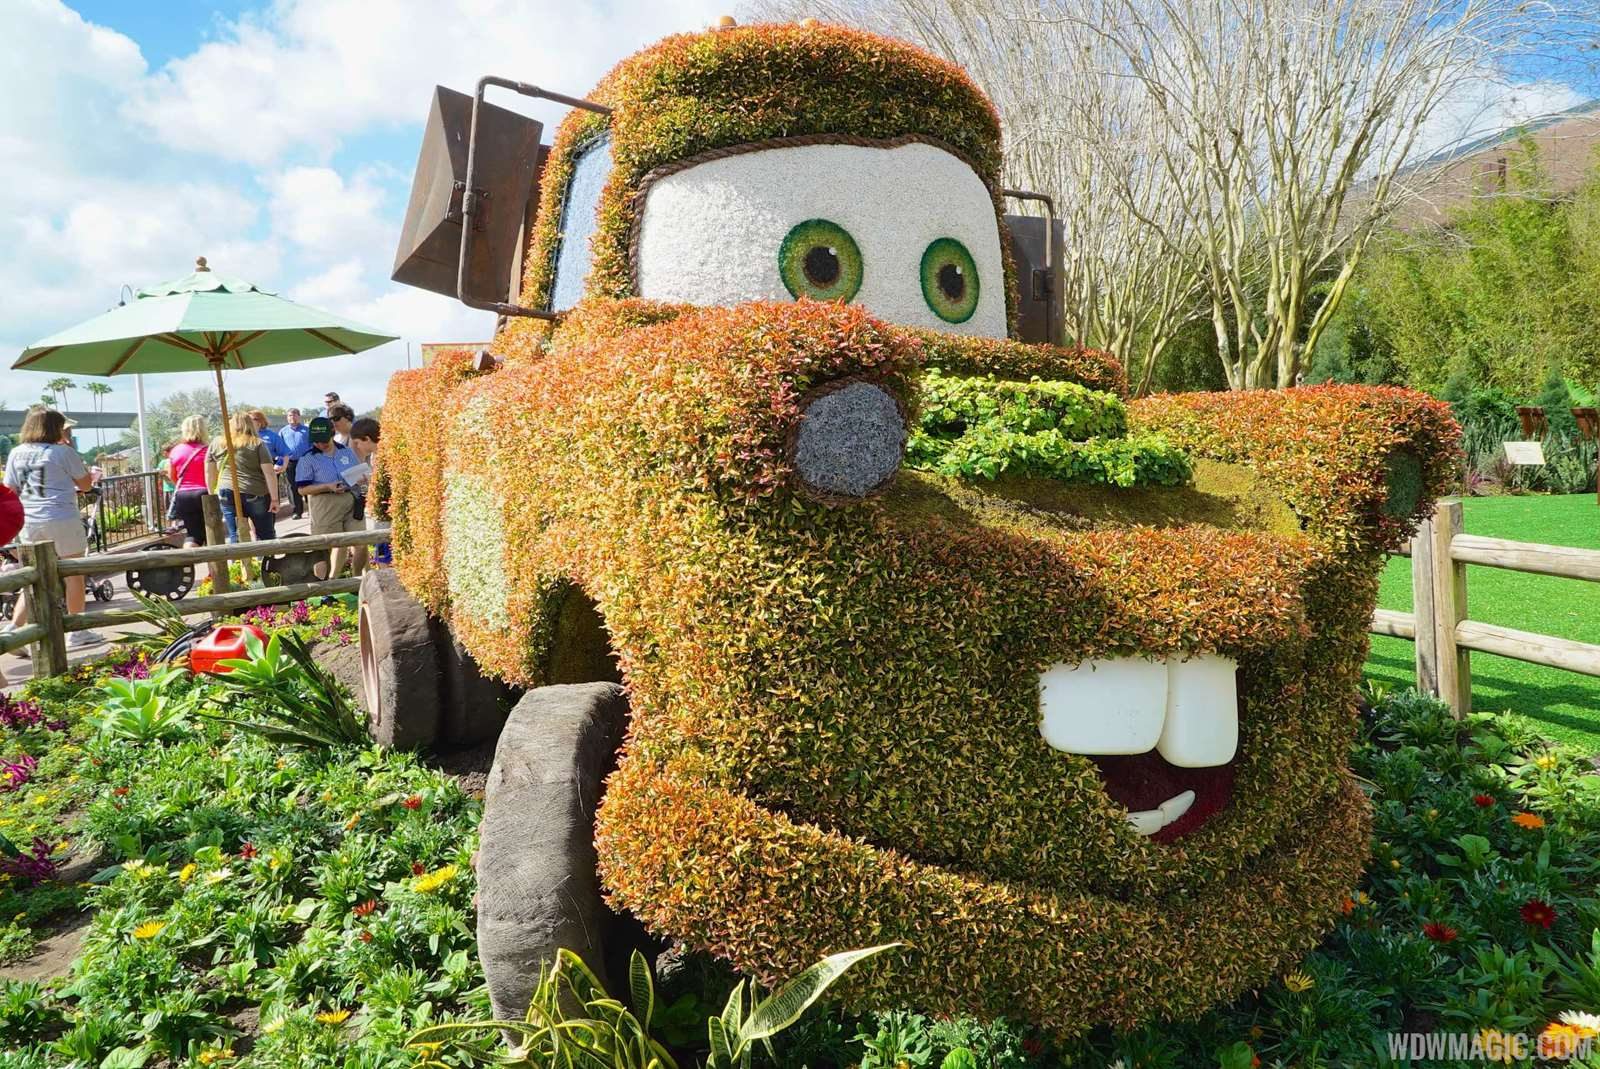 PHOTOS - Take a photo tour of the 2015 Epcot Flower and Garden Festival